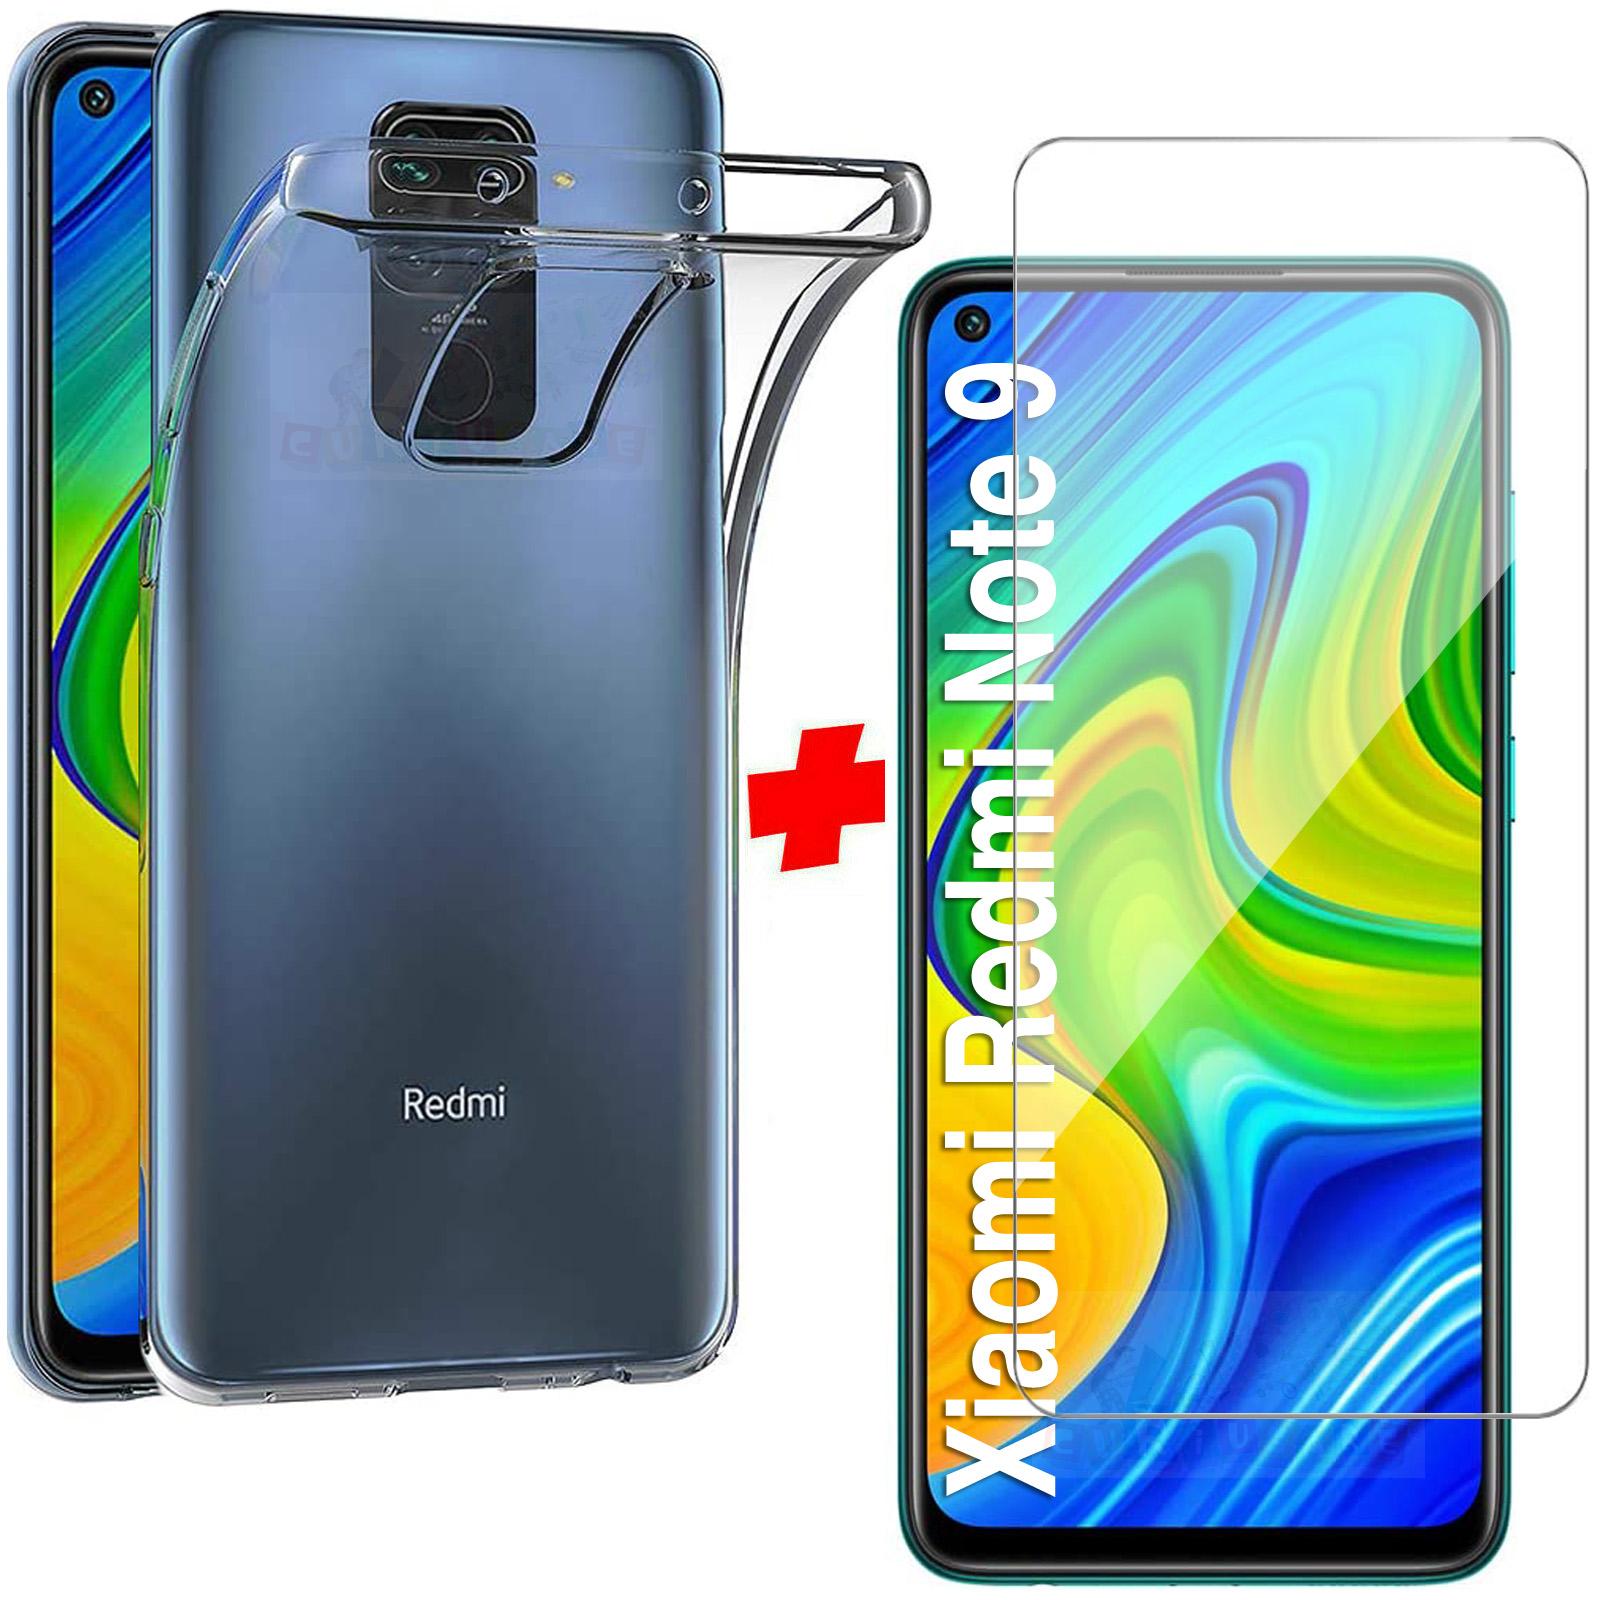 Cover e custodie Xiaomi Per Xiaomi Redmi Note per cellulari e palmari